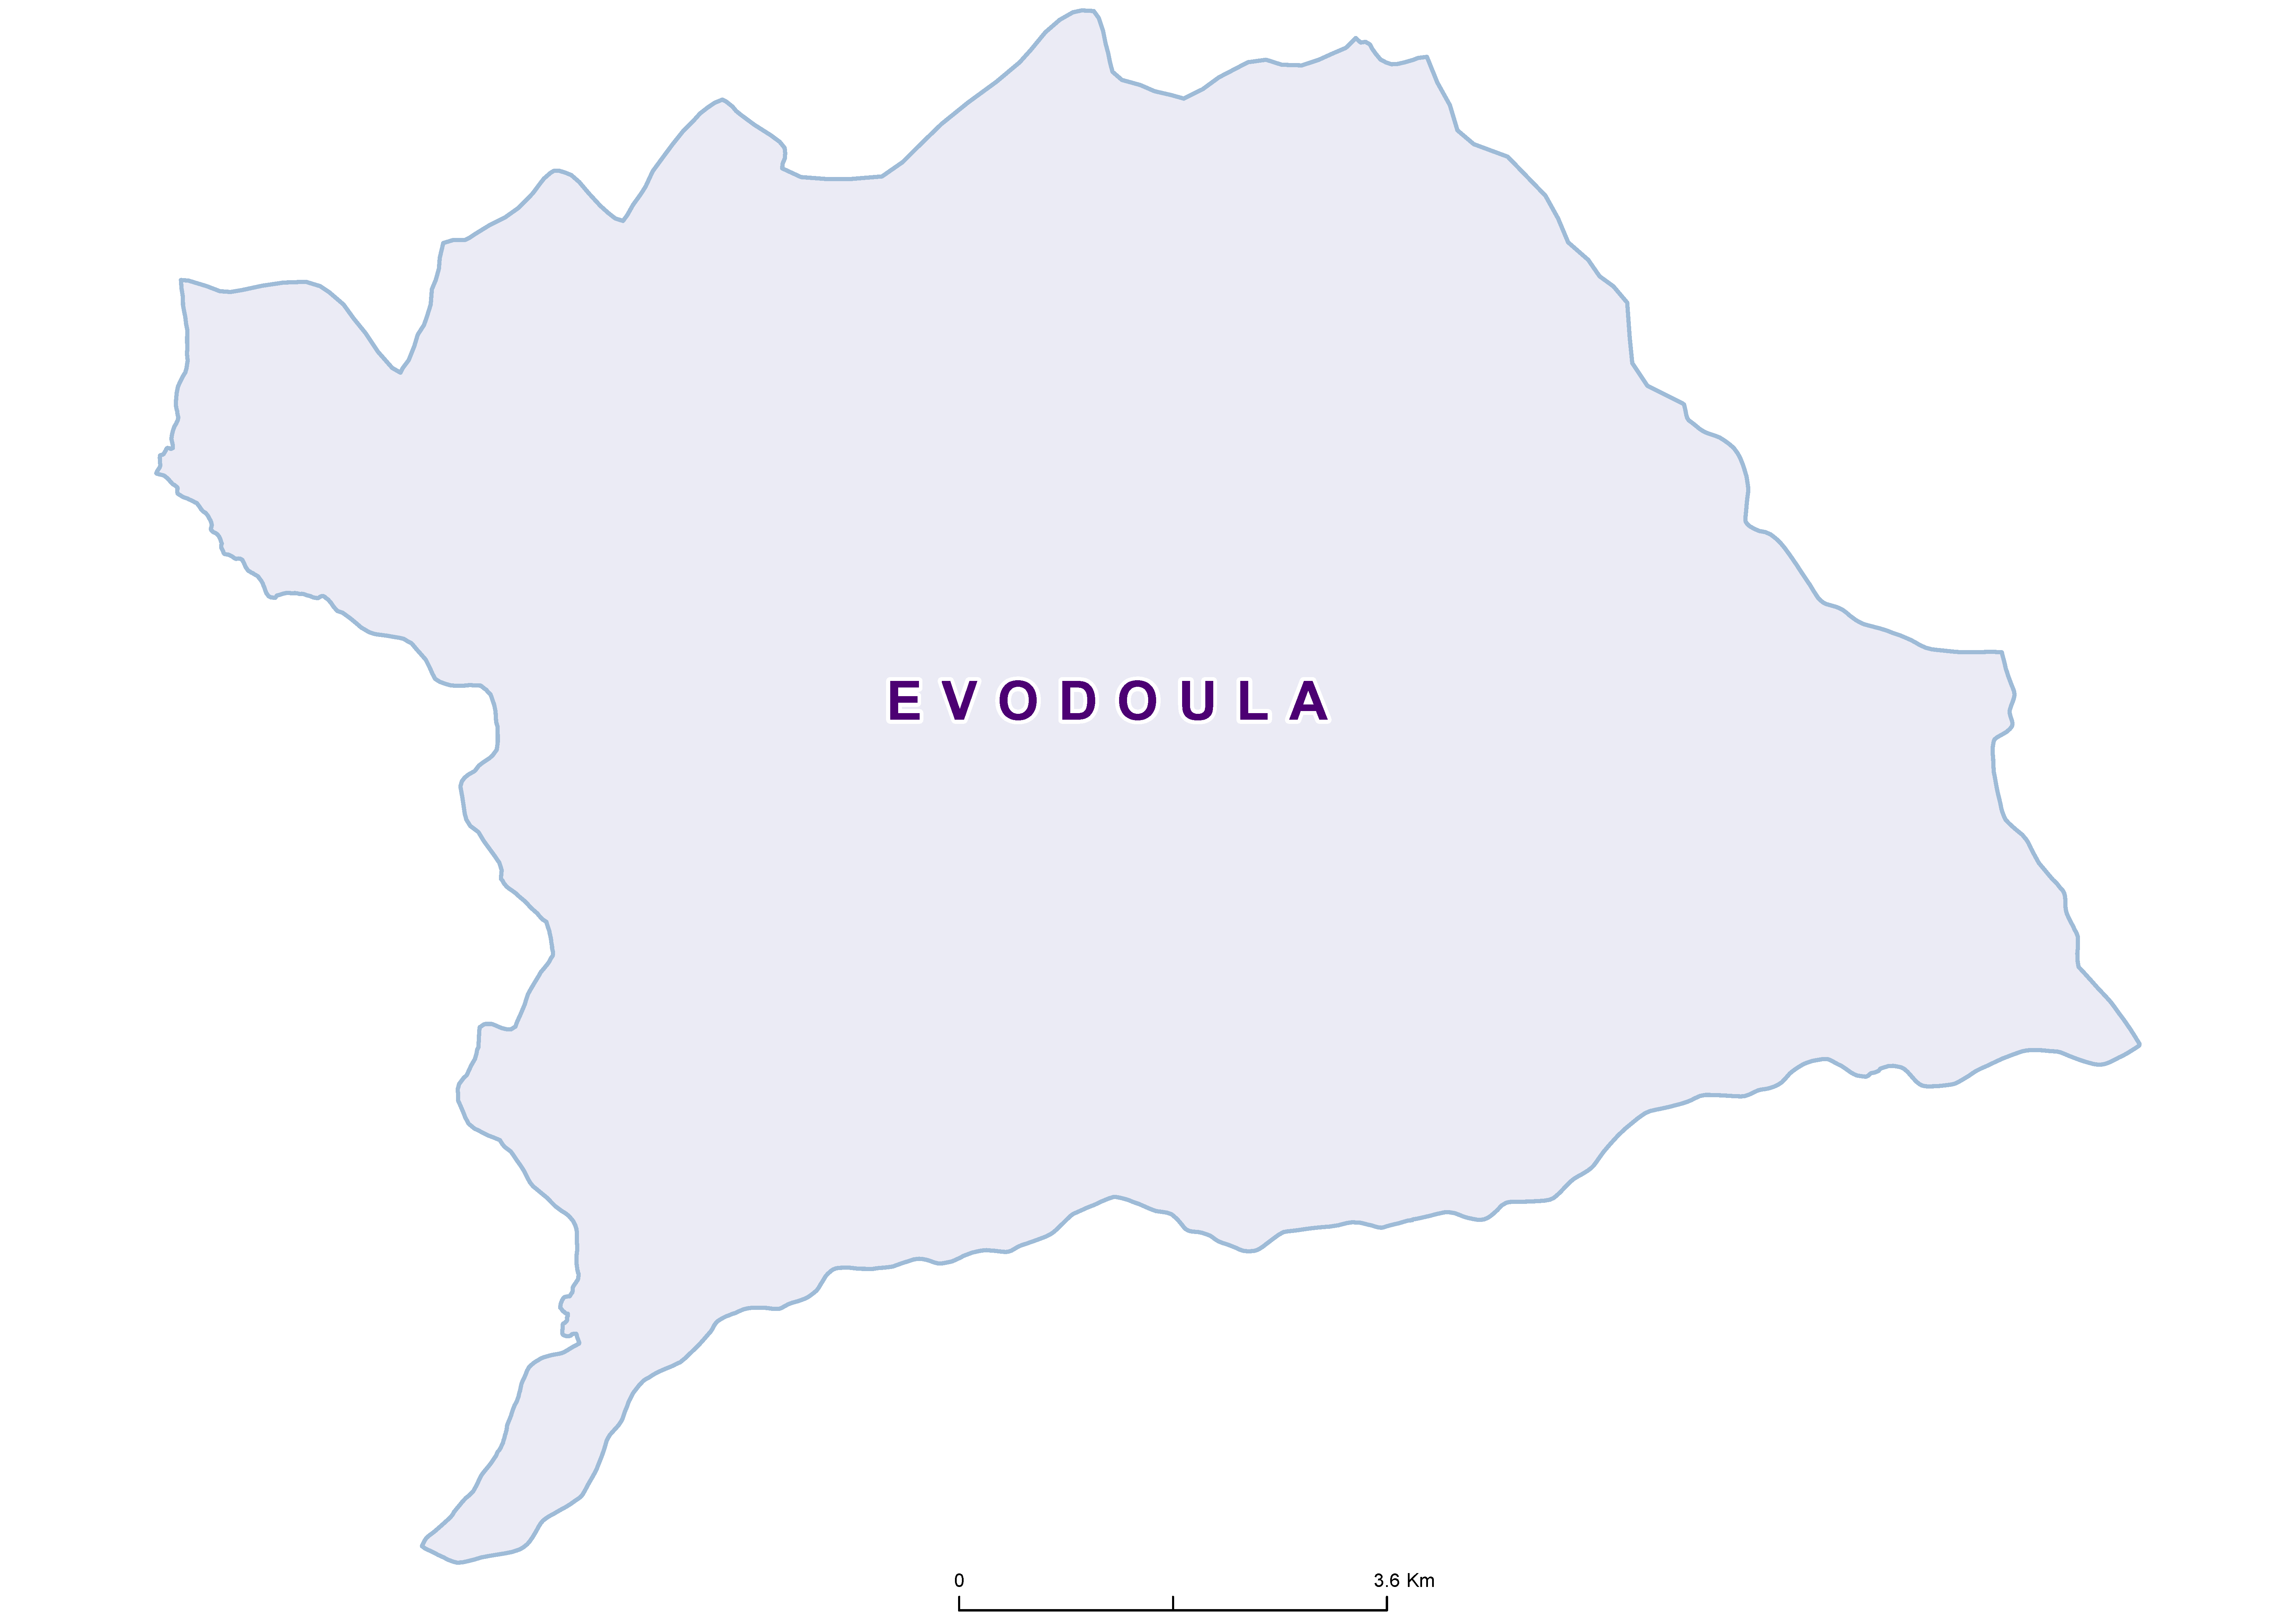 Evodoula Mean SCH 20180001